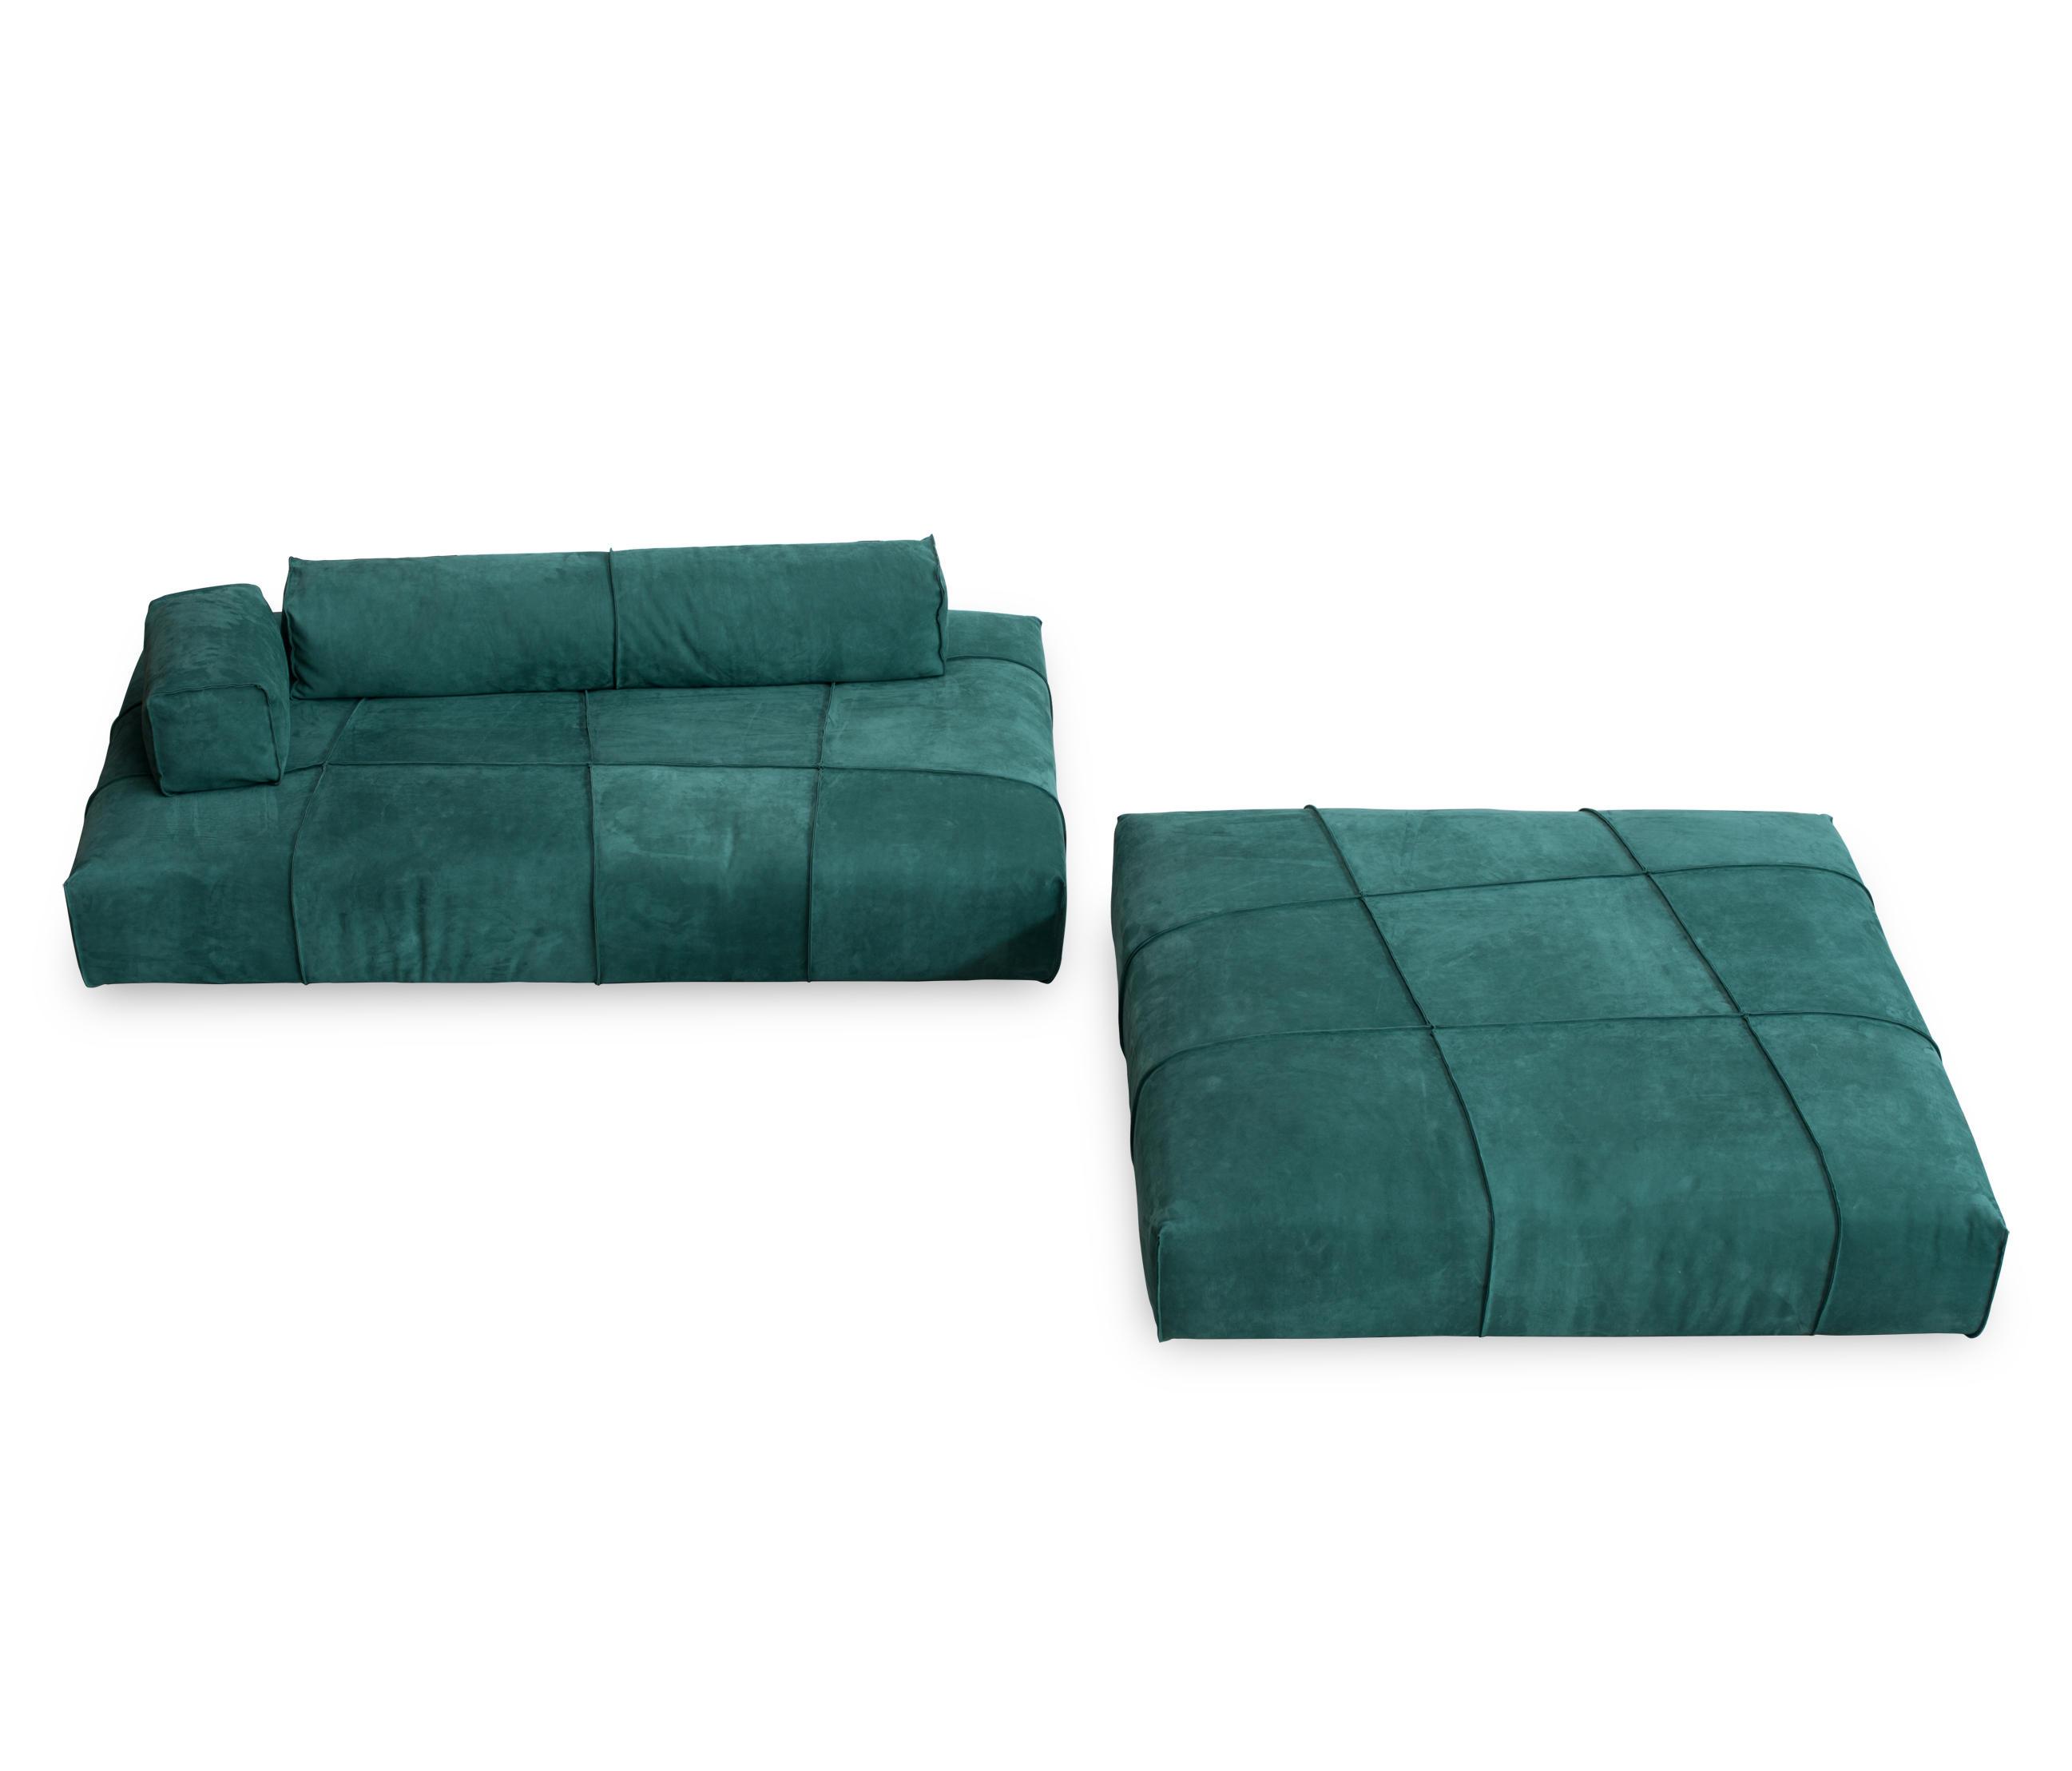 Sitzelemente Couch : Panama bold modular sofa modulare sitzelemente von